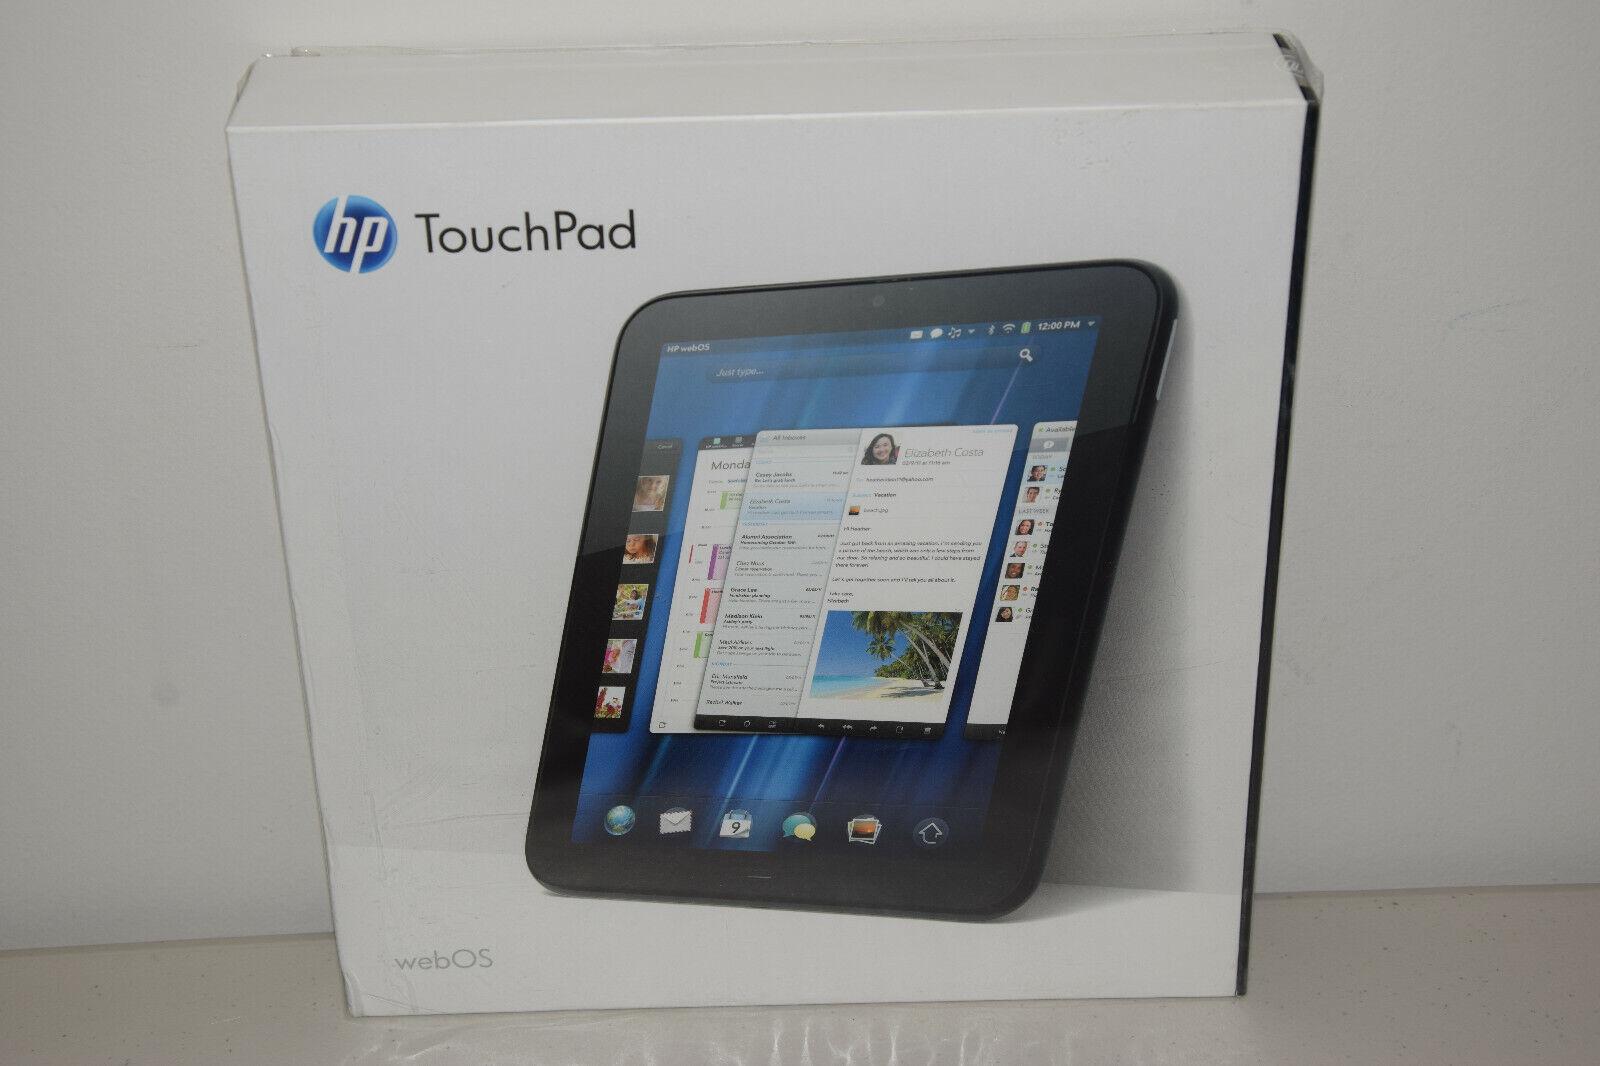 HP TouchPad FB359UA 32GB, Wi-Fi, 9.7in - Glossy Black Tablet Computer BRAND NEWW